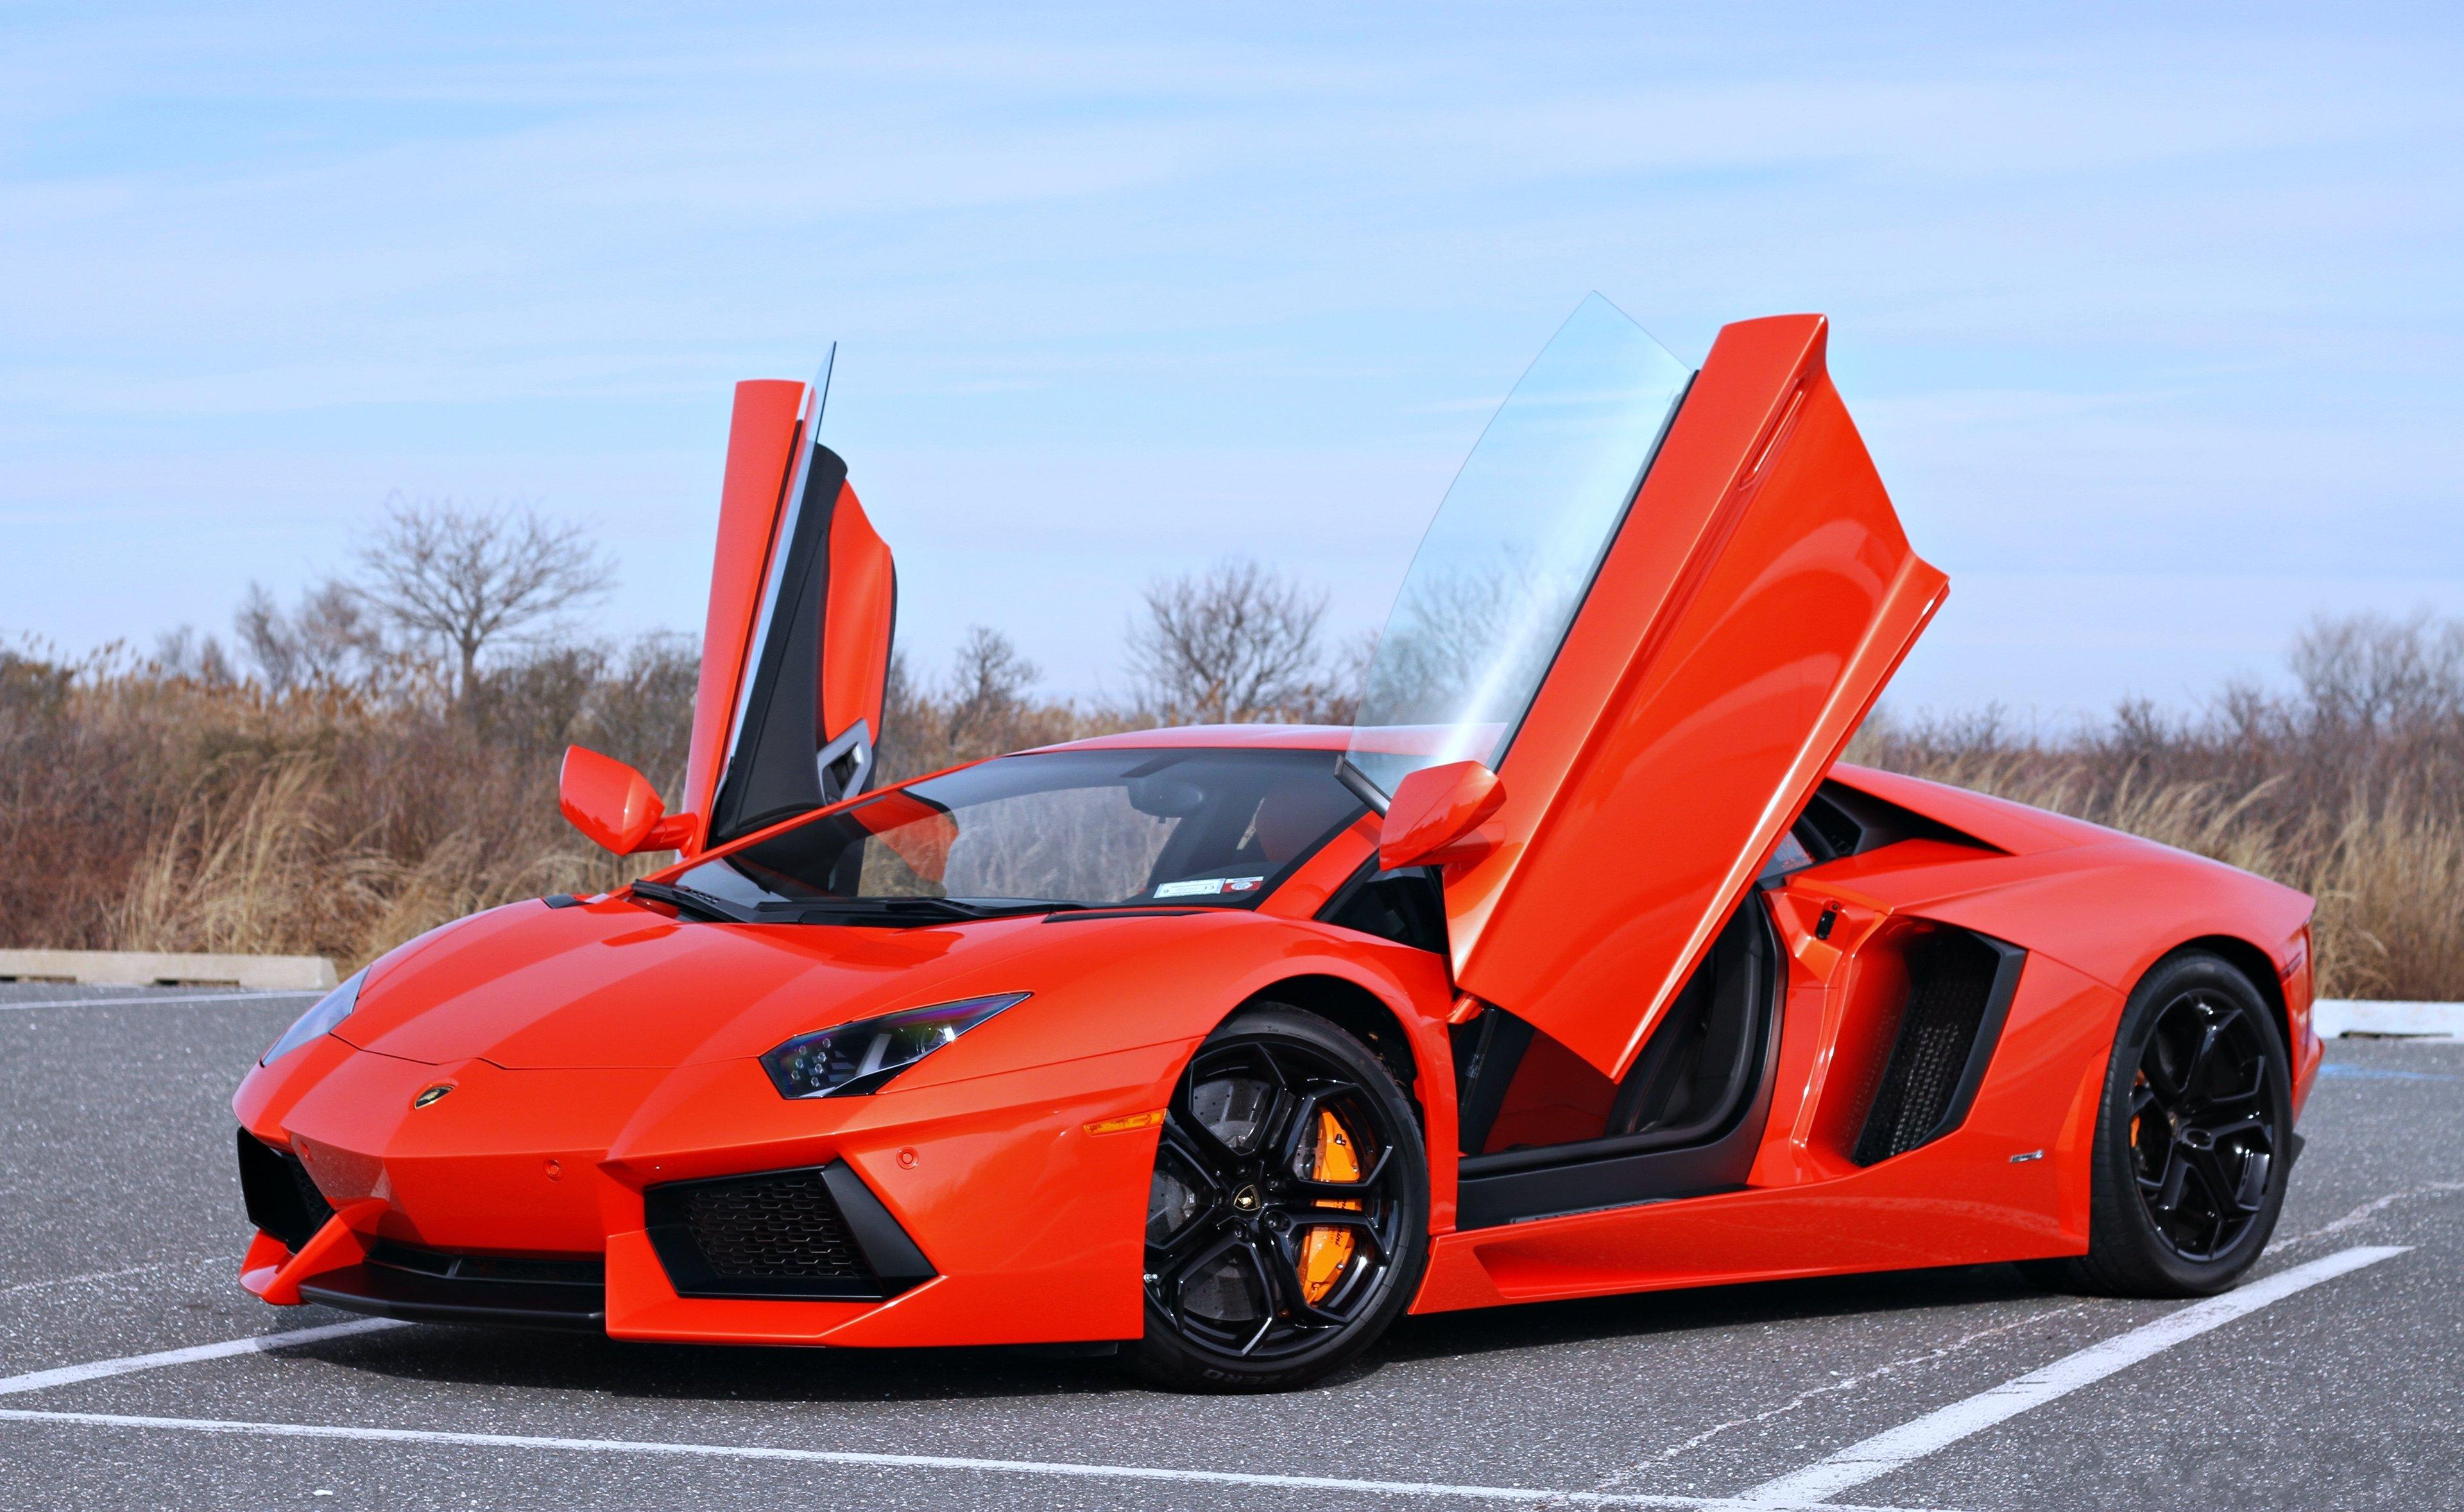 Lamborghini Aventador Orange Roard Speed Supercar Cars